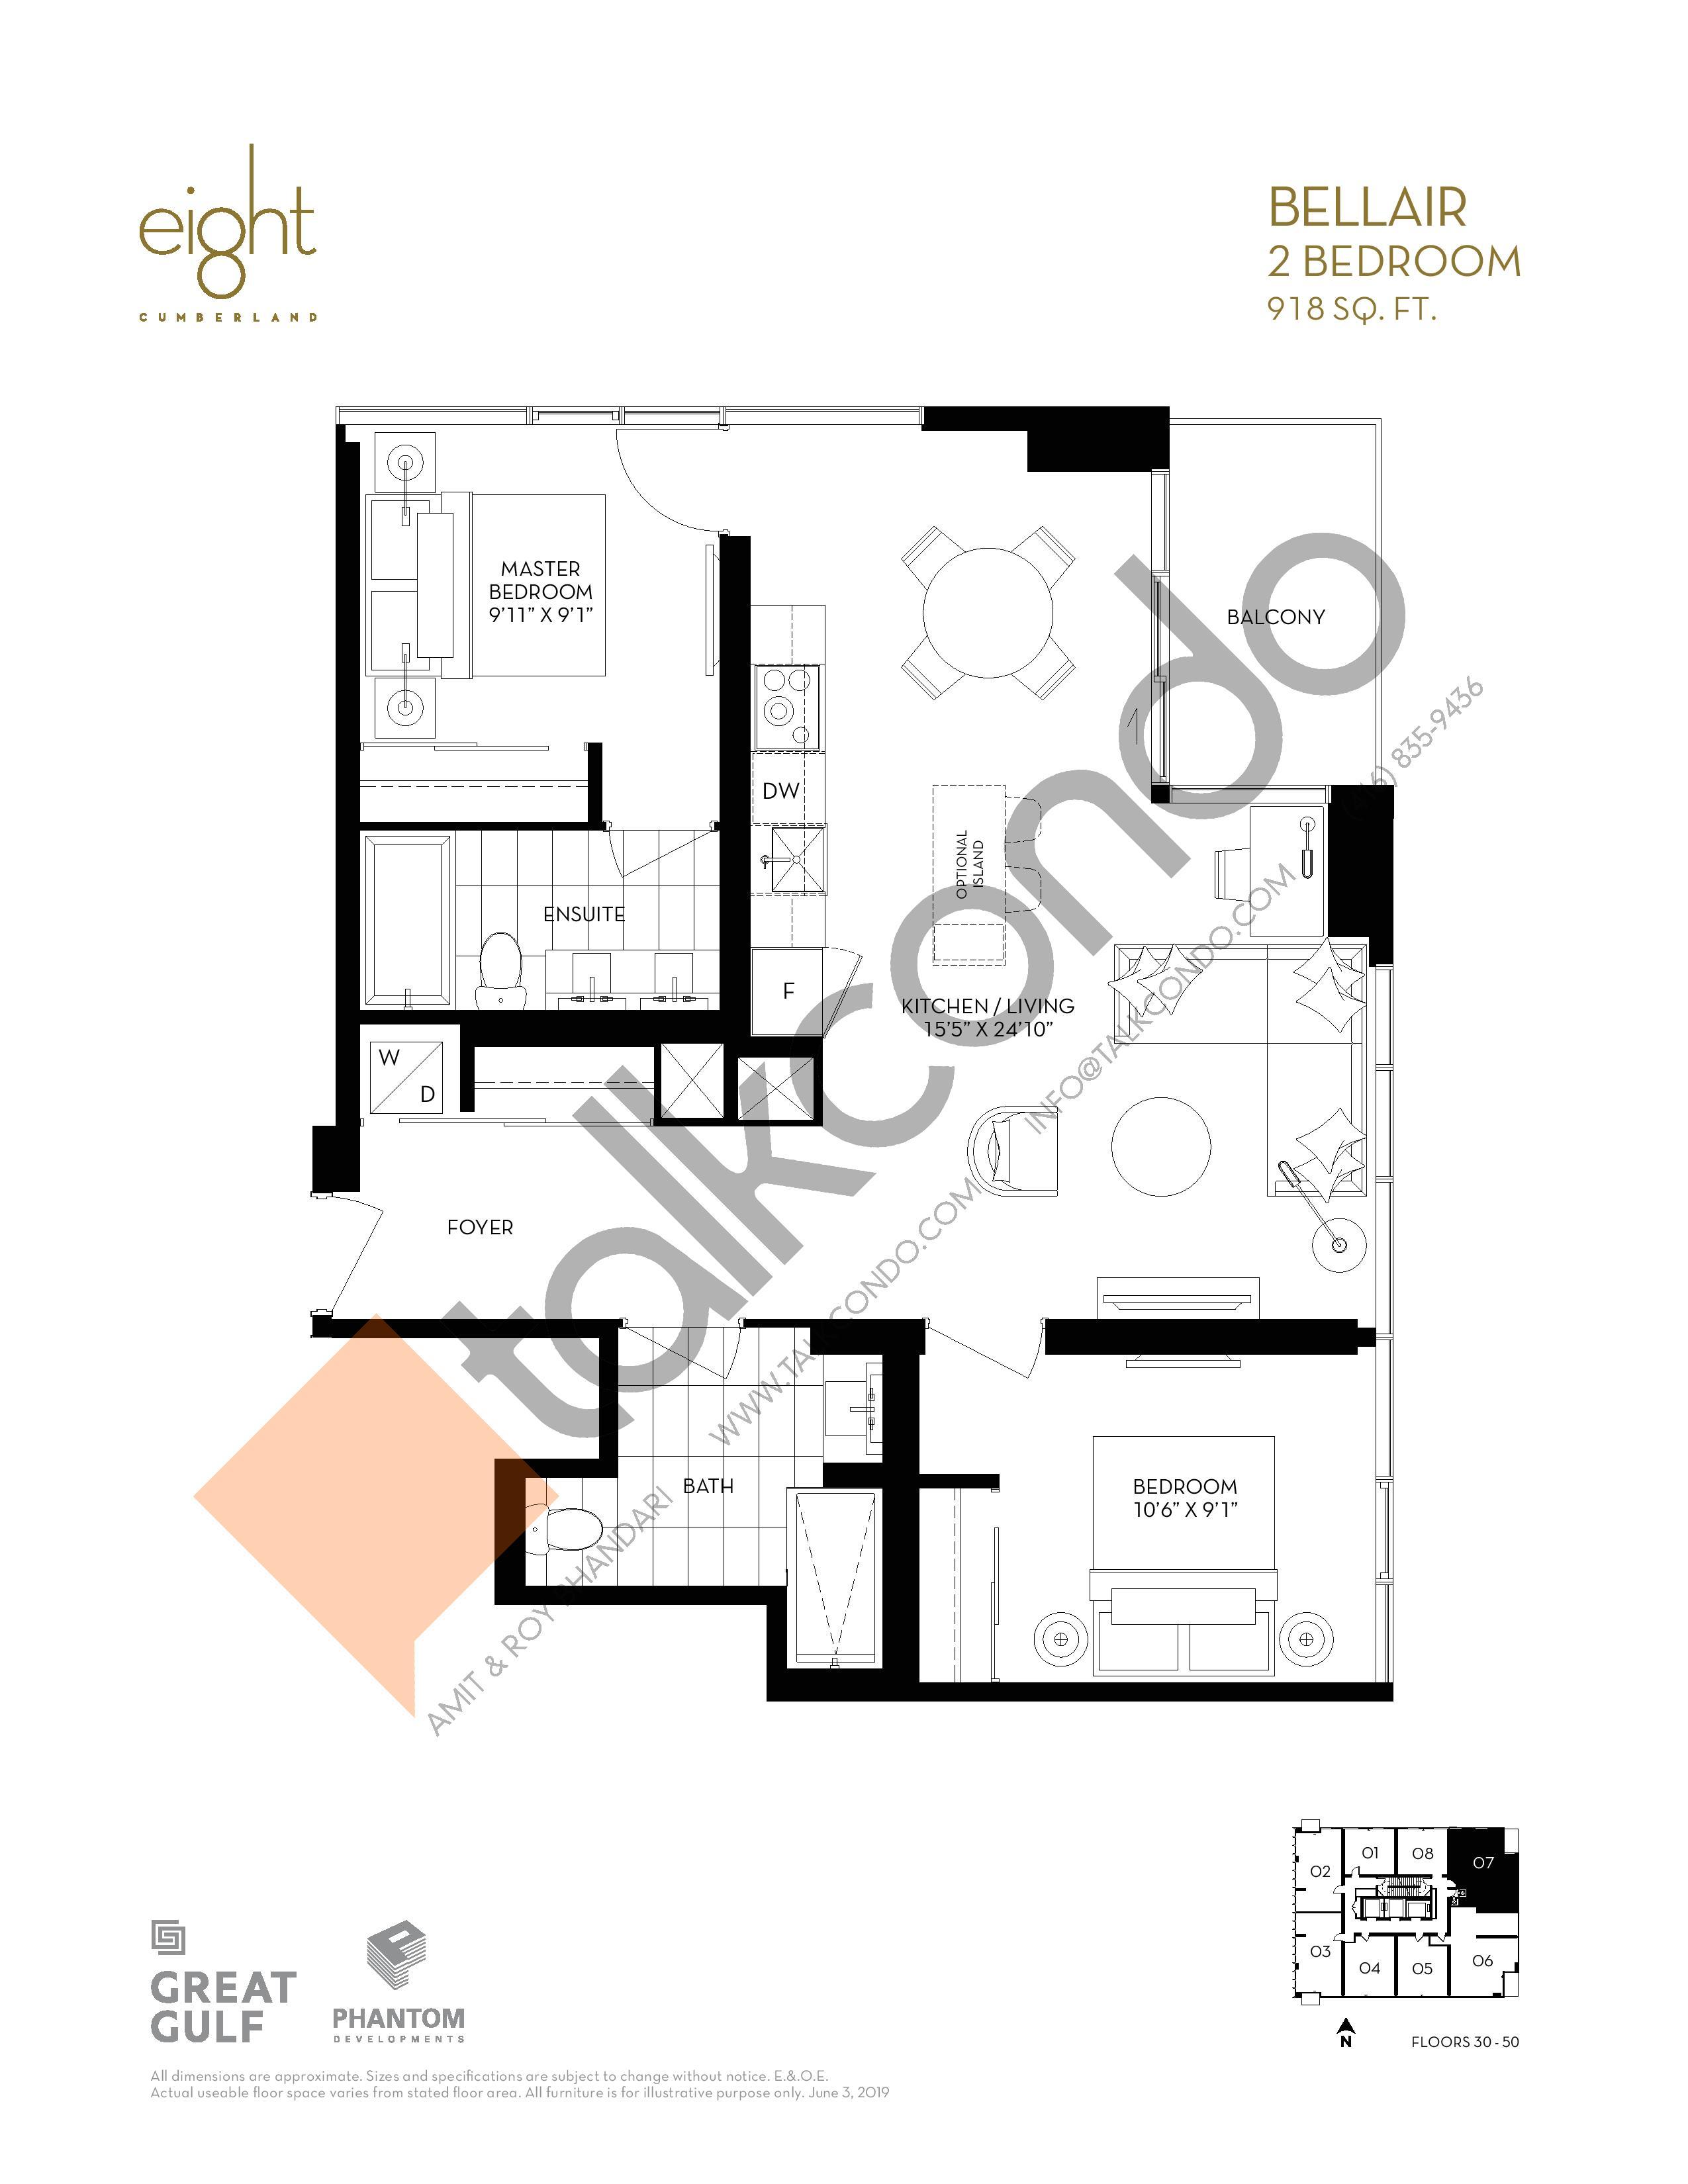 Bellair Floor Plan at 8 Cumberland Condos - 918 sq.ft